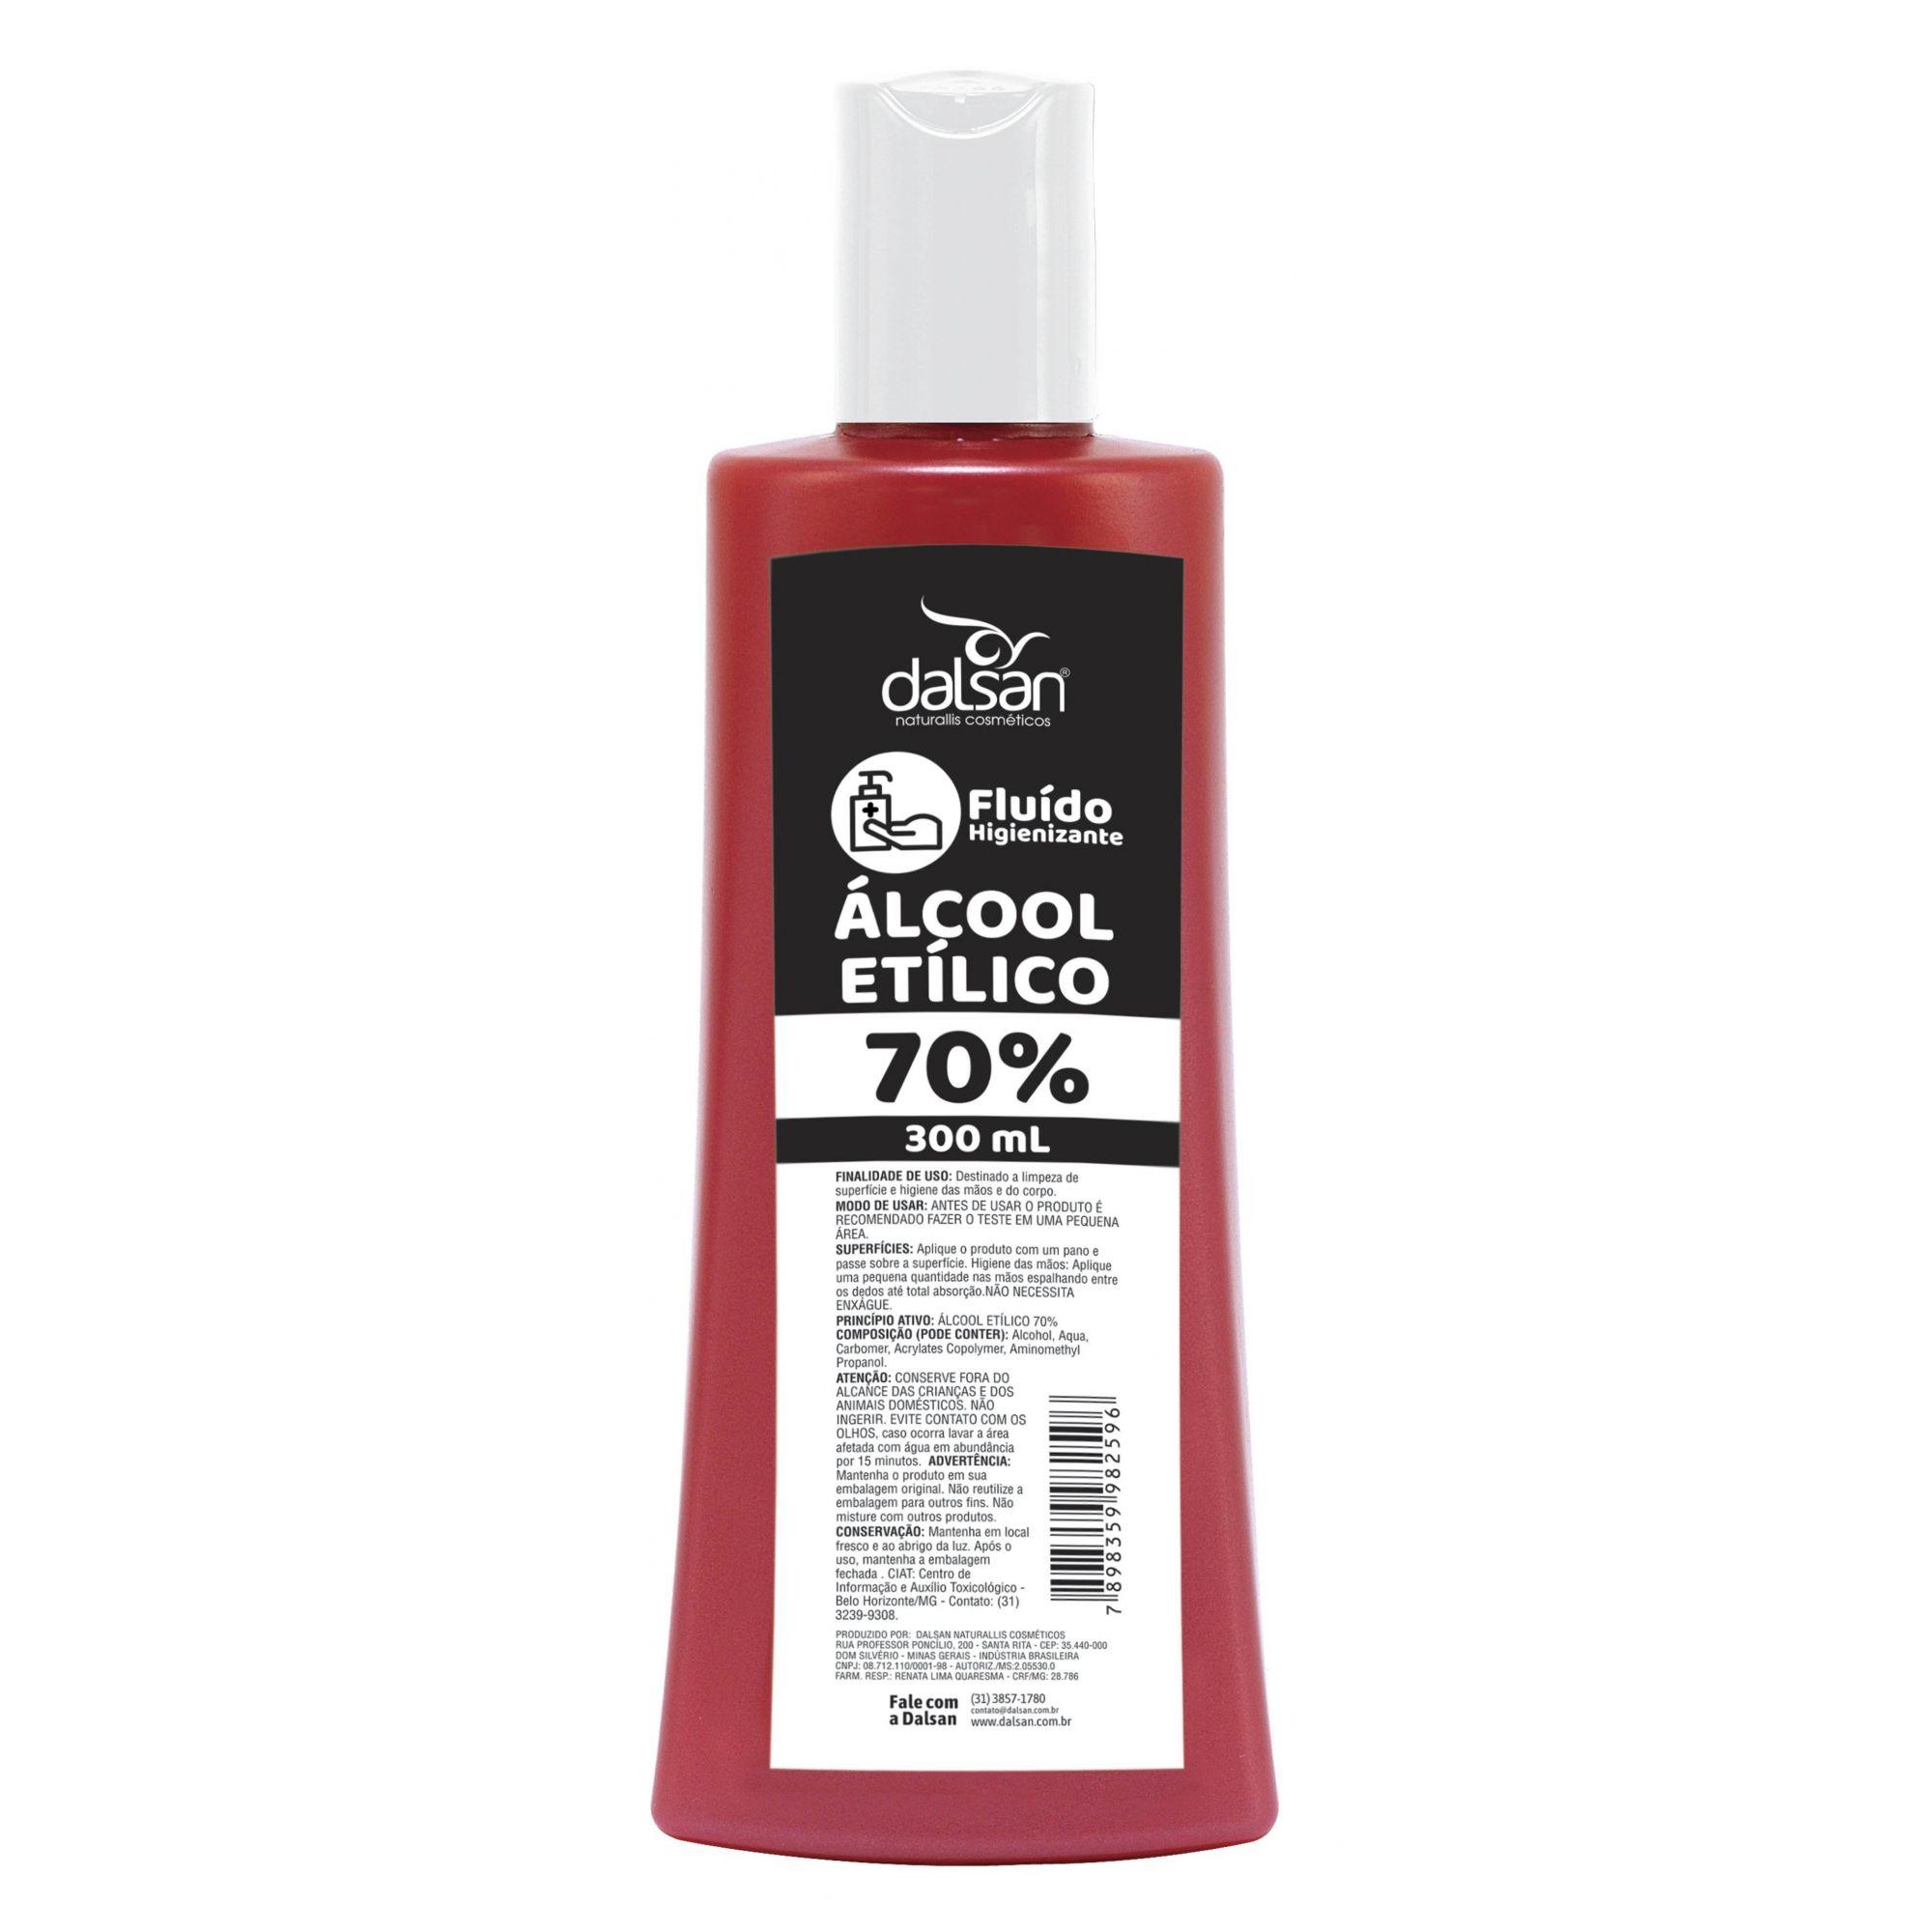 Álcool em Gel Antisséptico Etílico 70% Higienizador Maos Corpo Limpeza Superficie